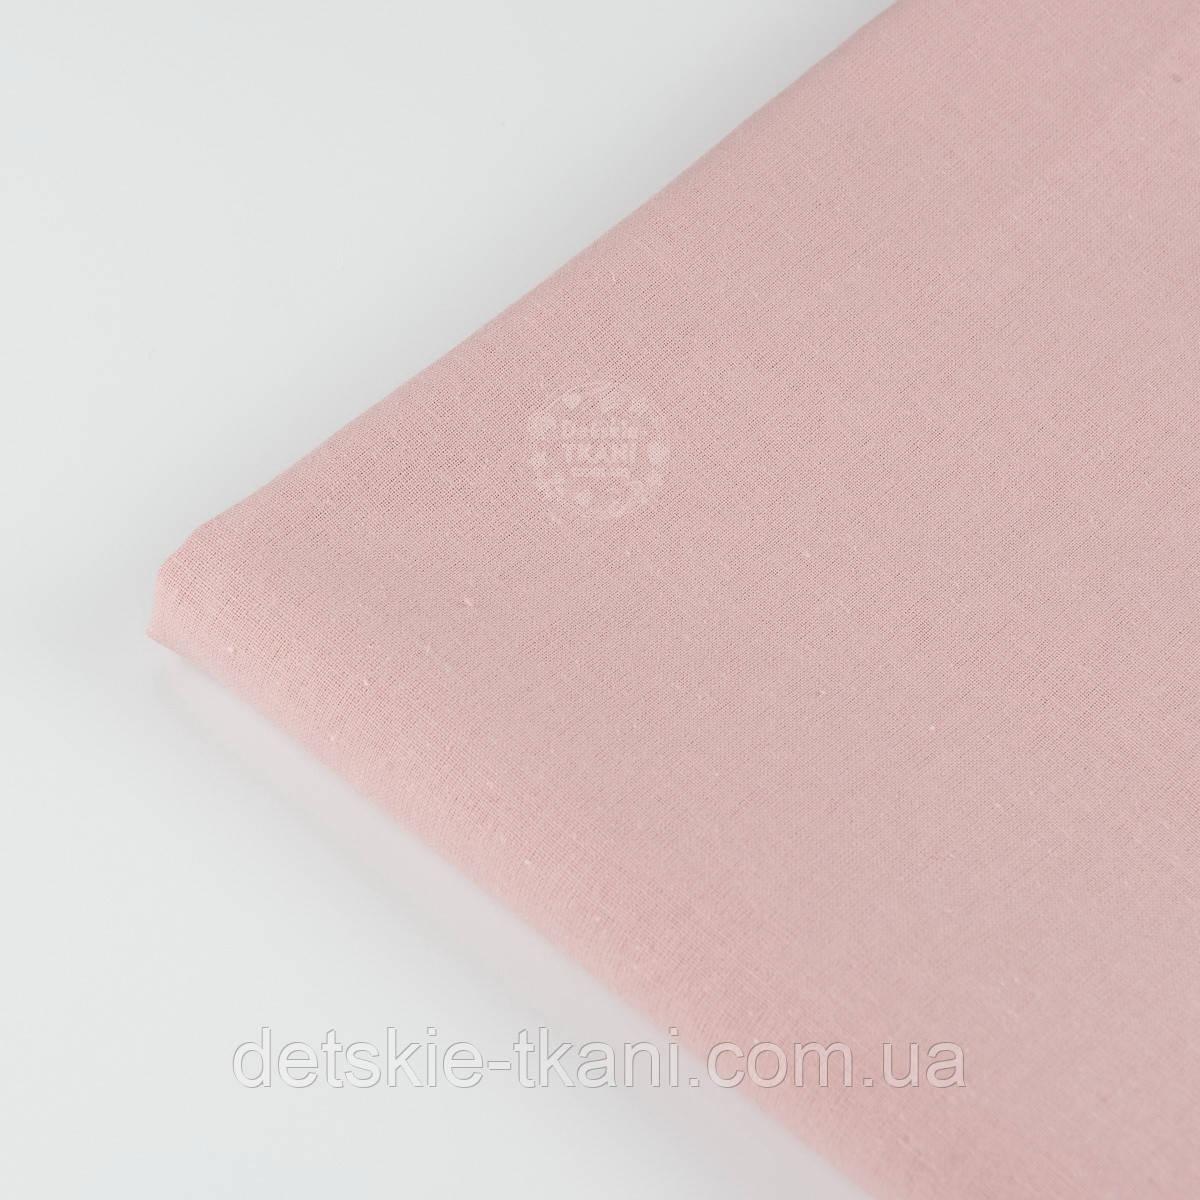 Лоскут ткани грязно-розового цвета, №1350а, размер 32*80 см